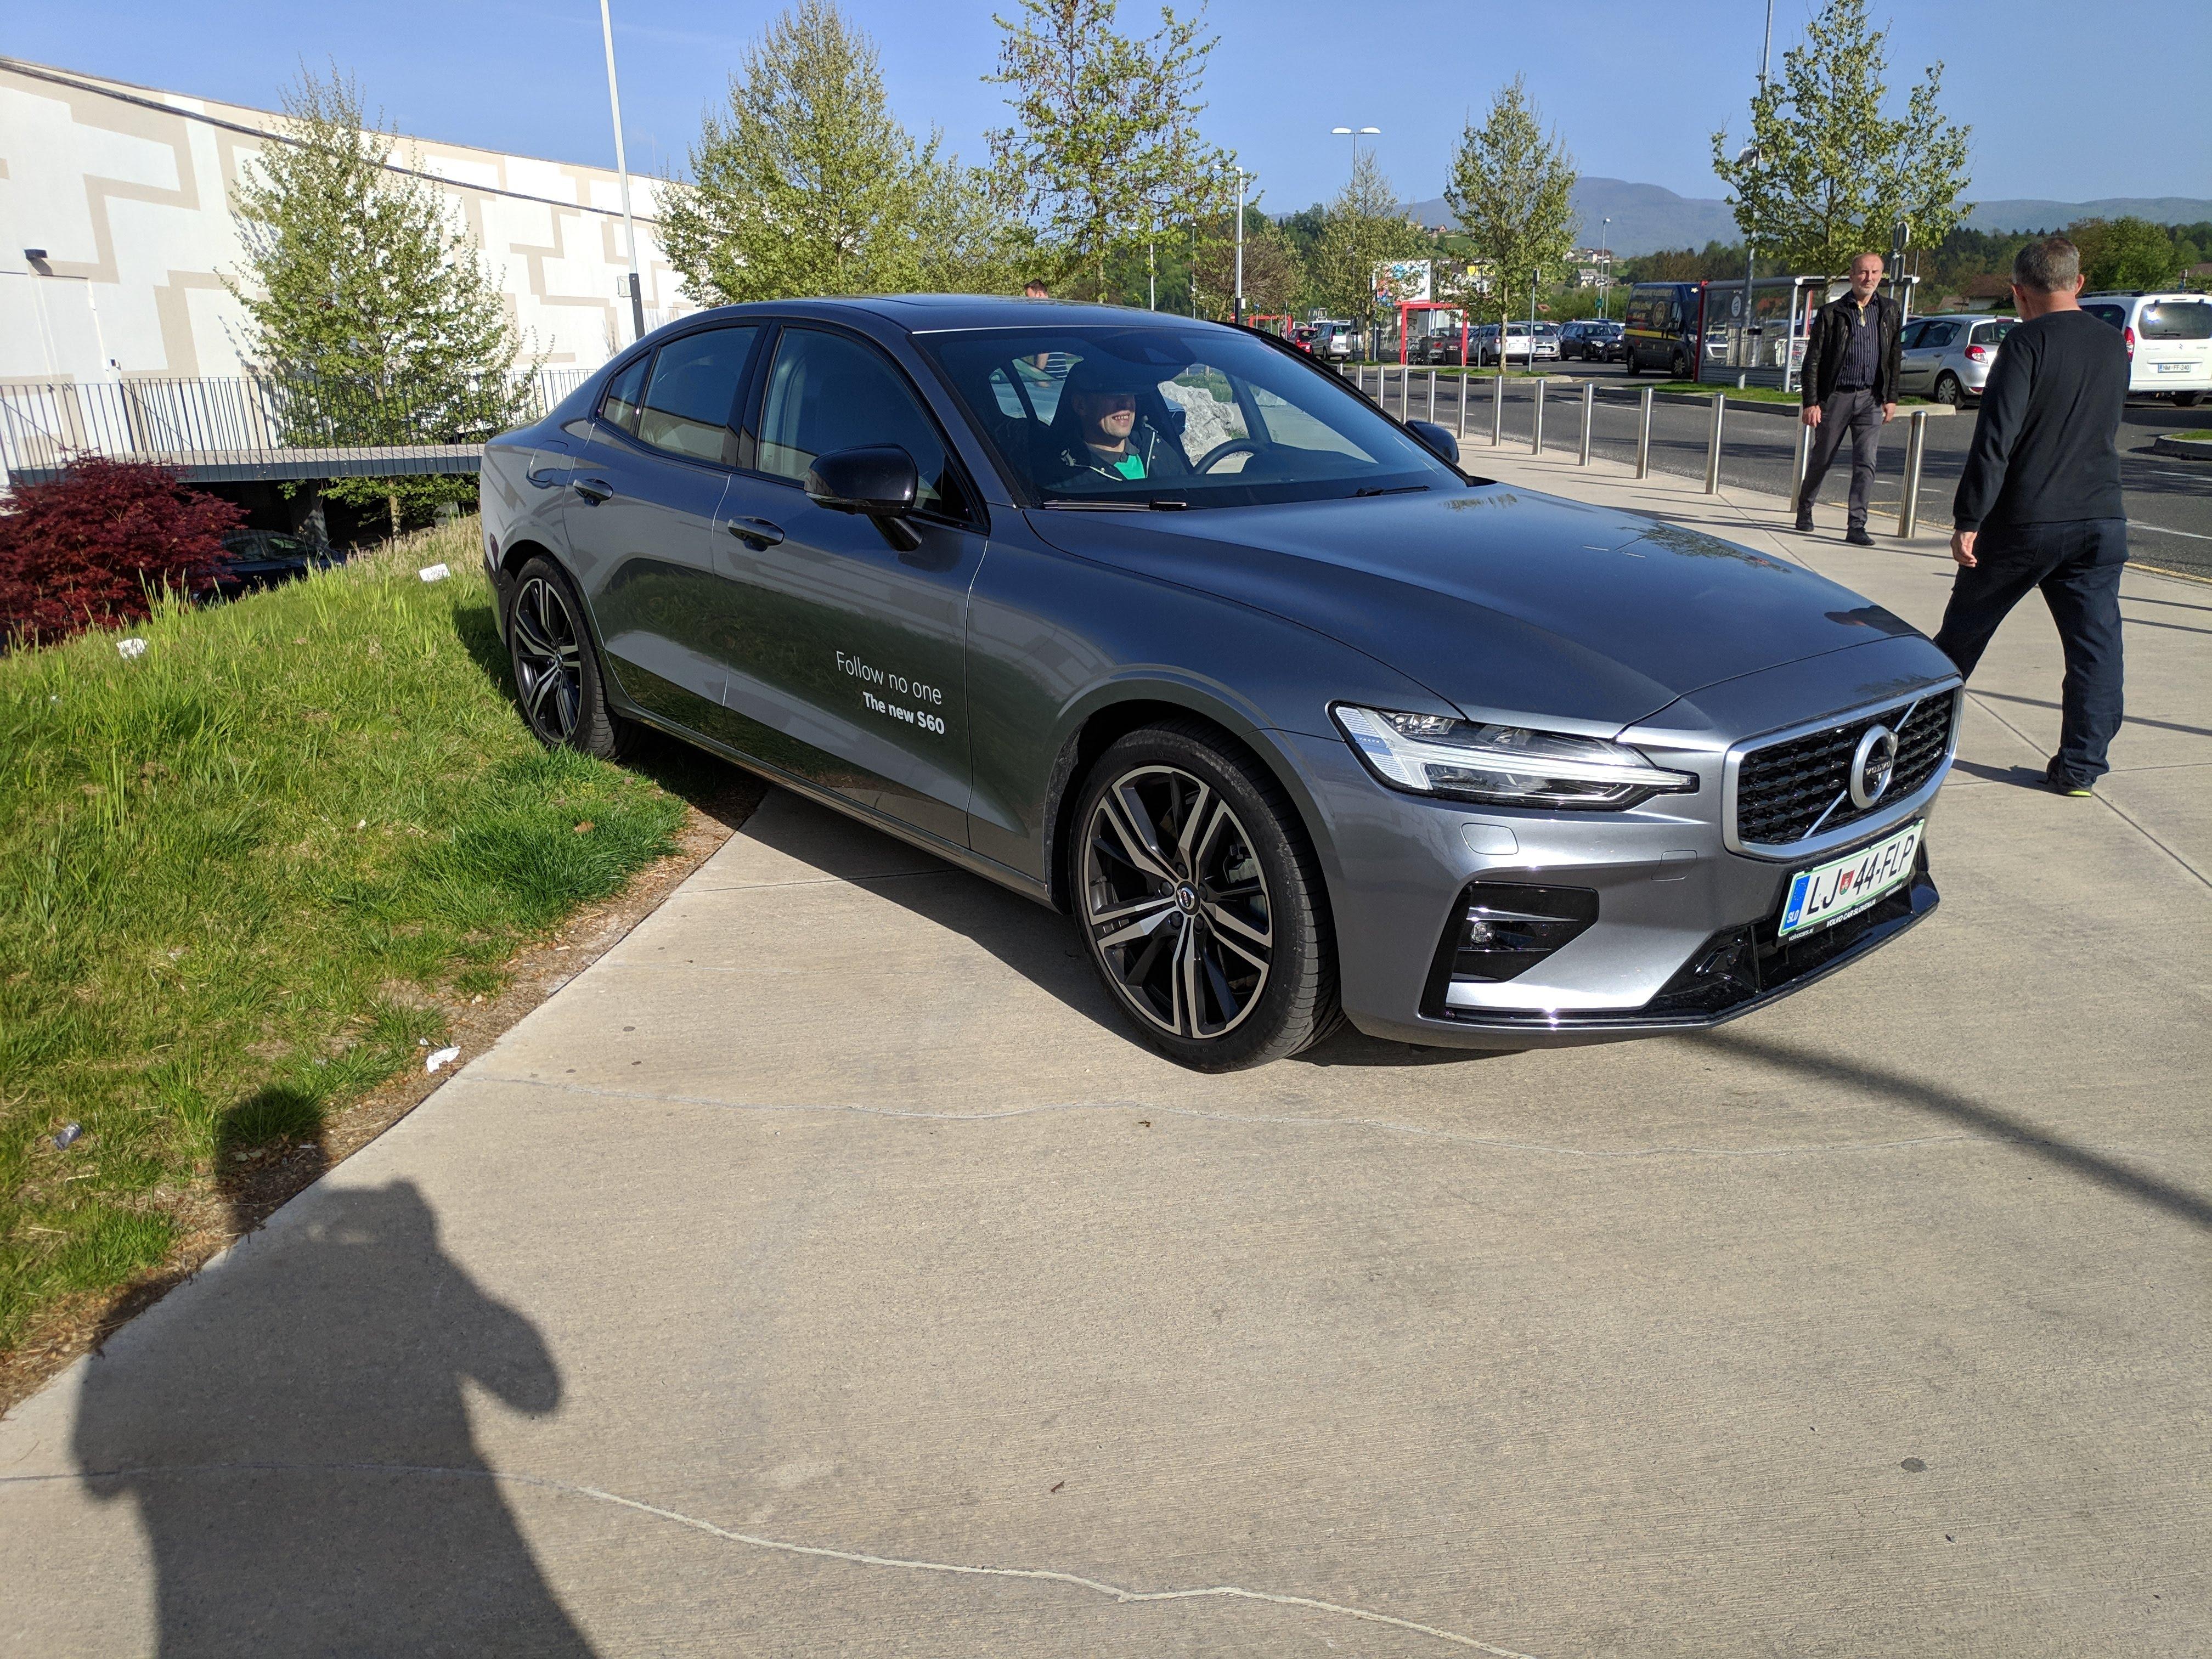 2018 - [Volvo] S60/V60 - Page 10 Img20190425171719